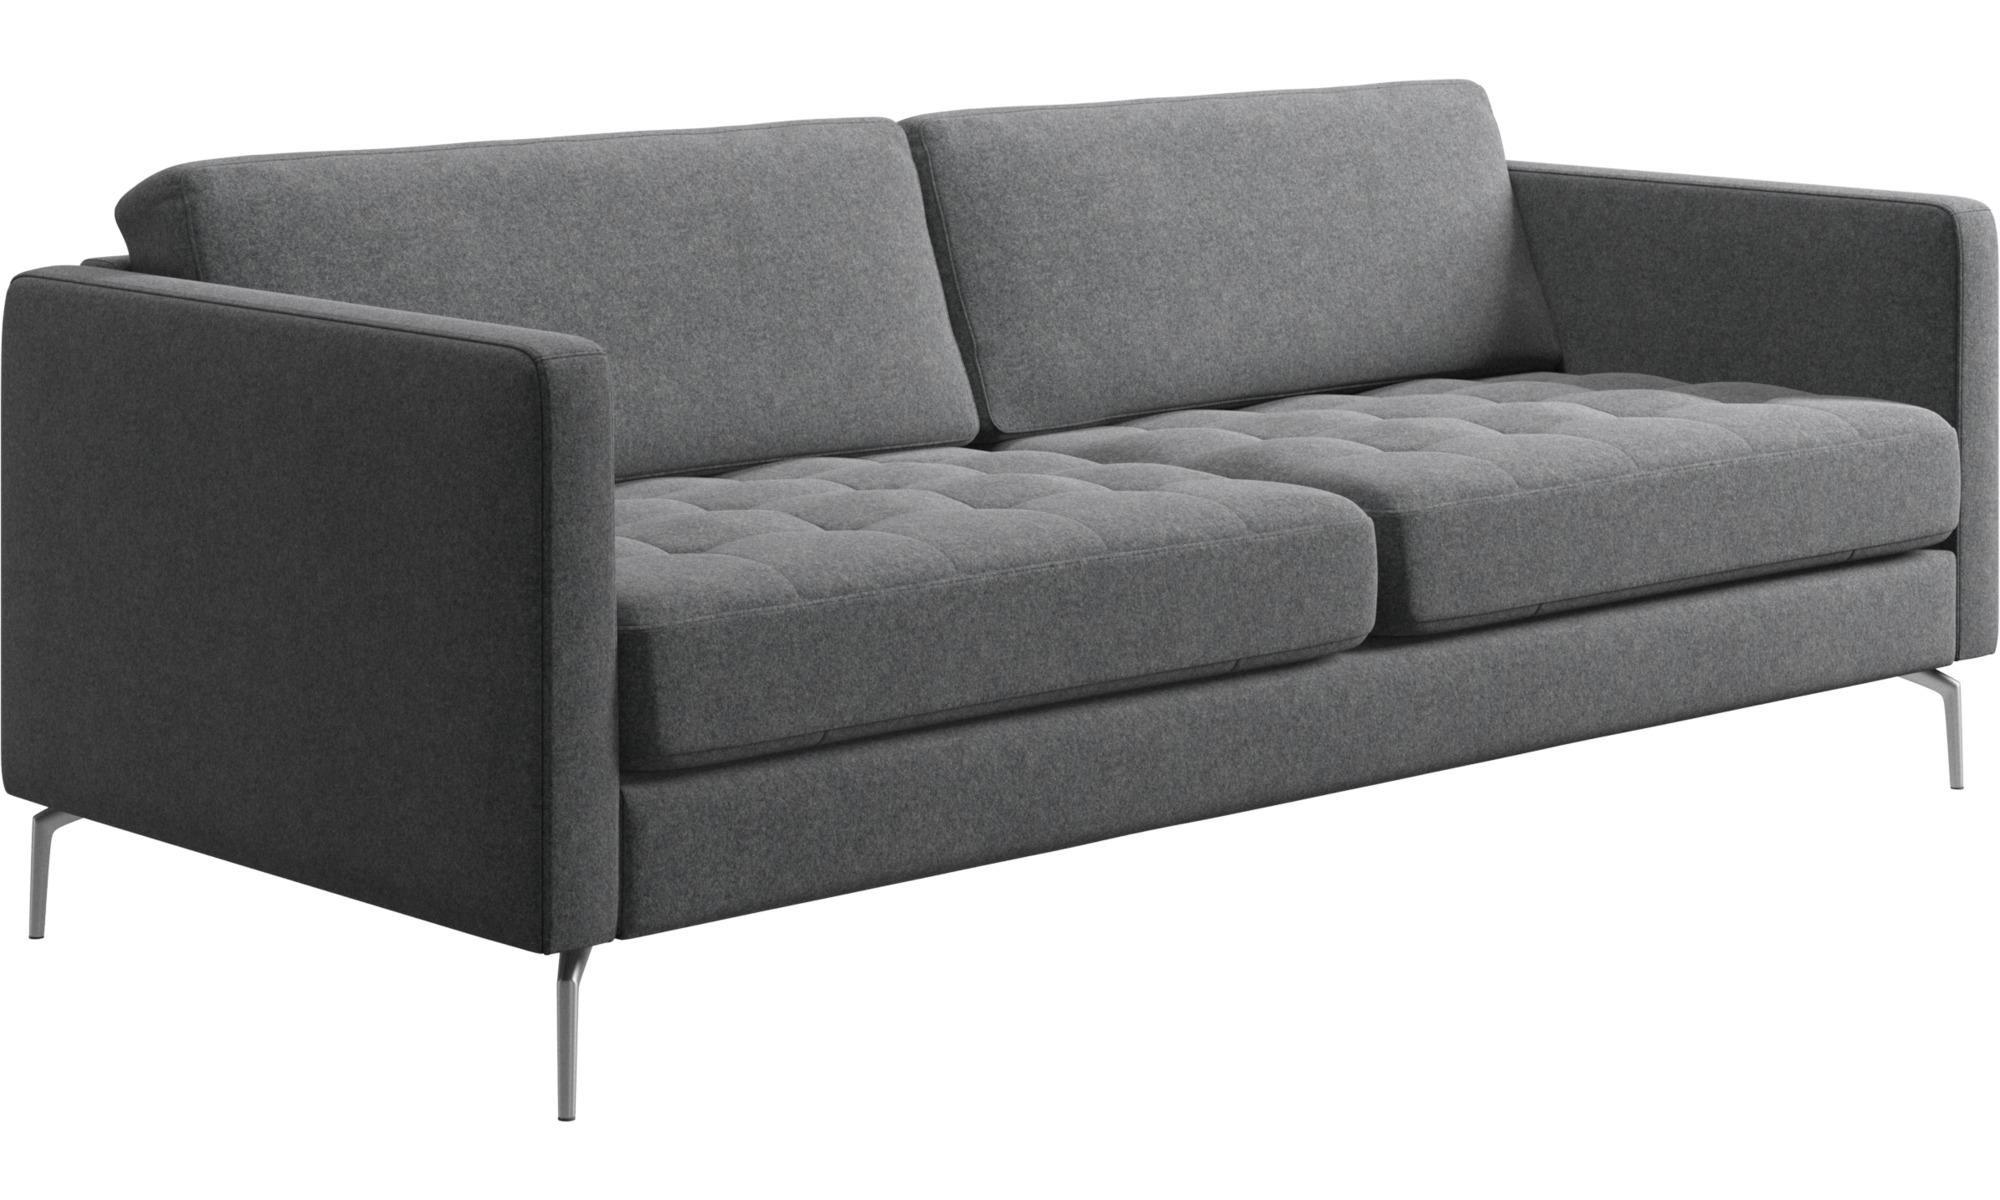 Sof s de 2 plazas y media sof osaka asiento en - Asientos para sofas ...